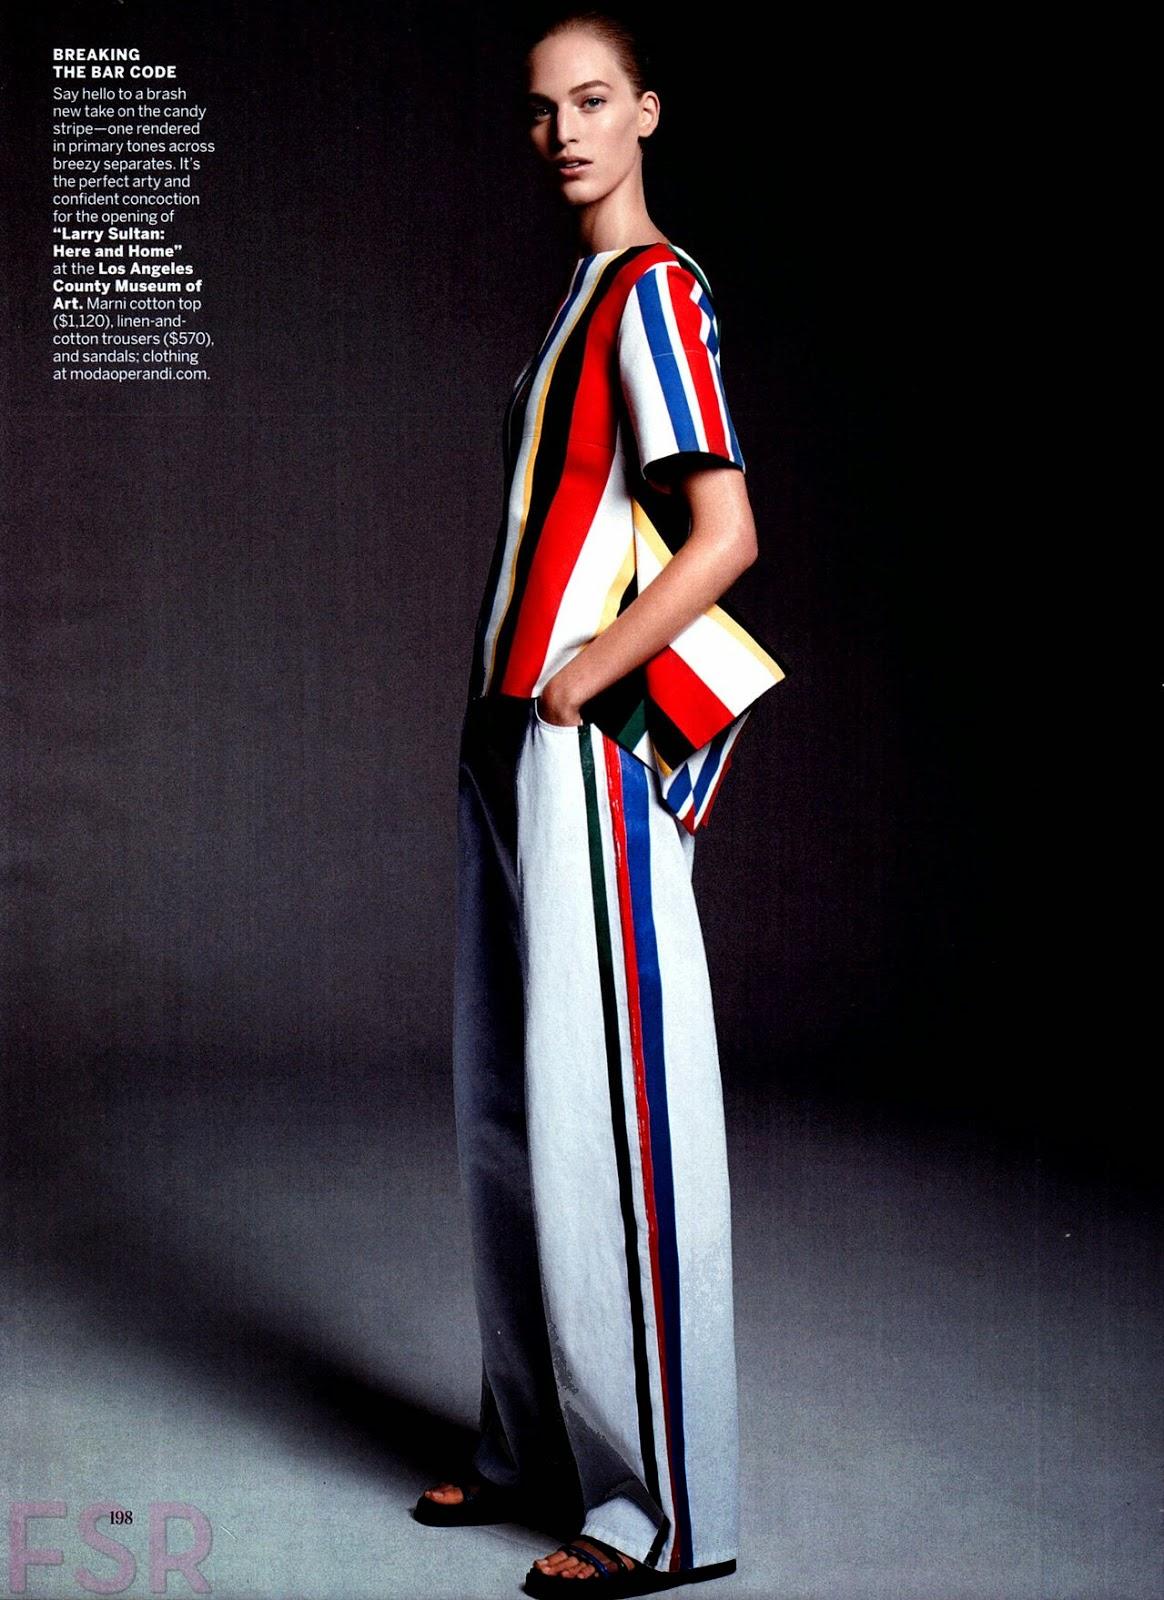 c53812b7d84 Vanessa Axente US Vogue - November 2014. Photographer - Karim Sadli Source  - thefashionspot.com